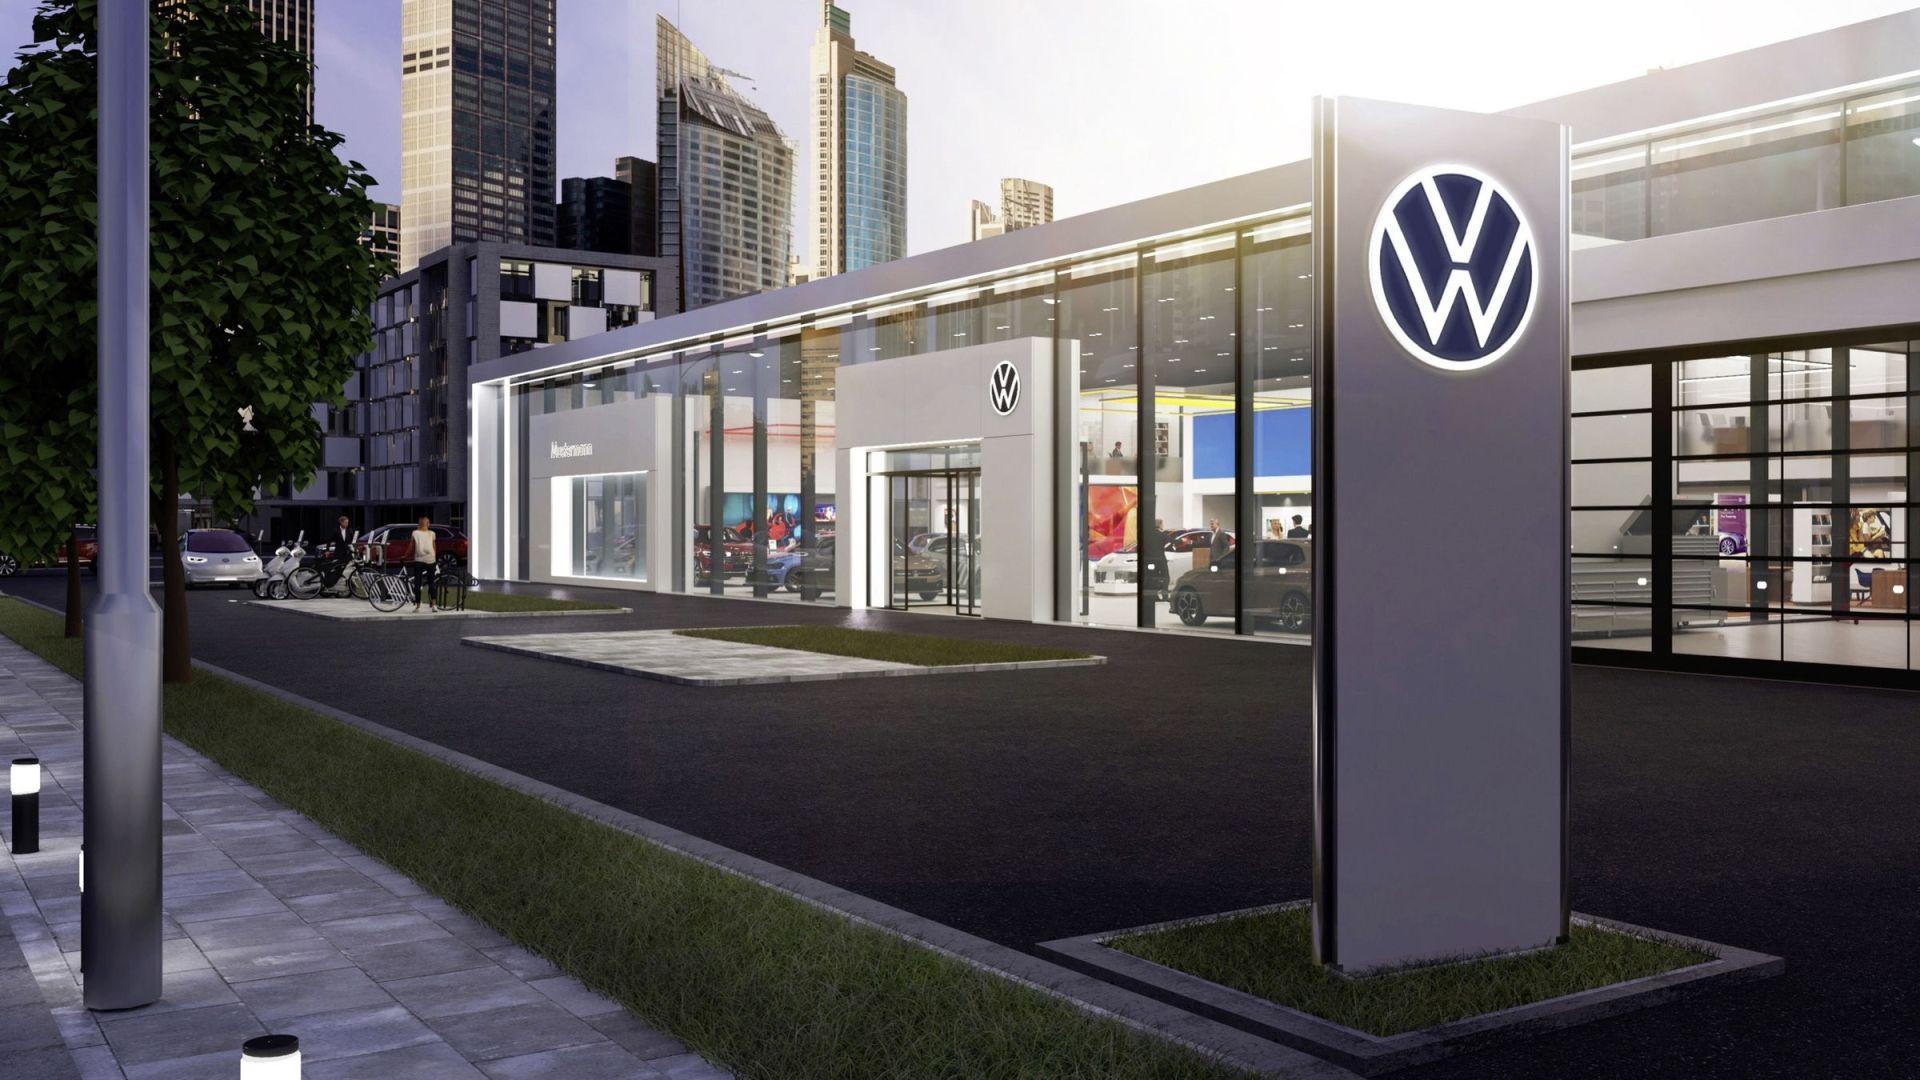 Volkswagen Kicks Off Dawn Of New Design Era With Updated Logo